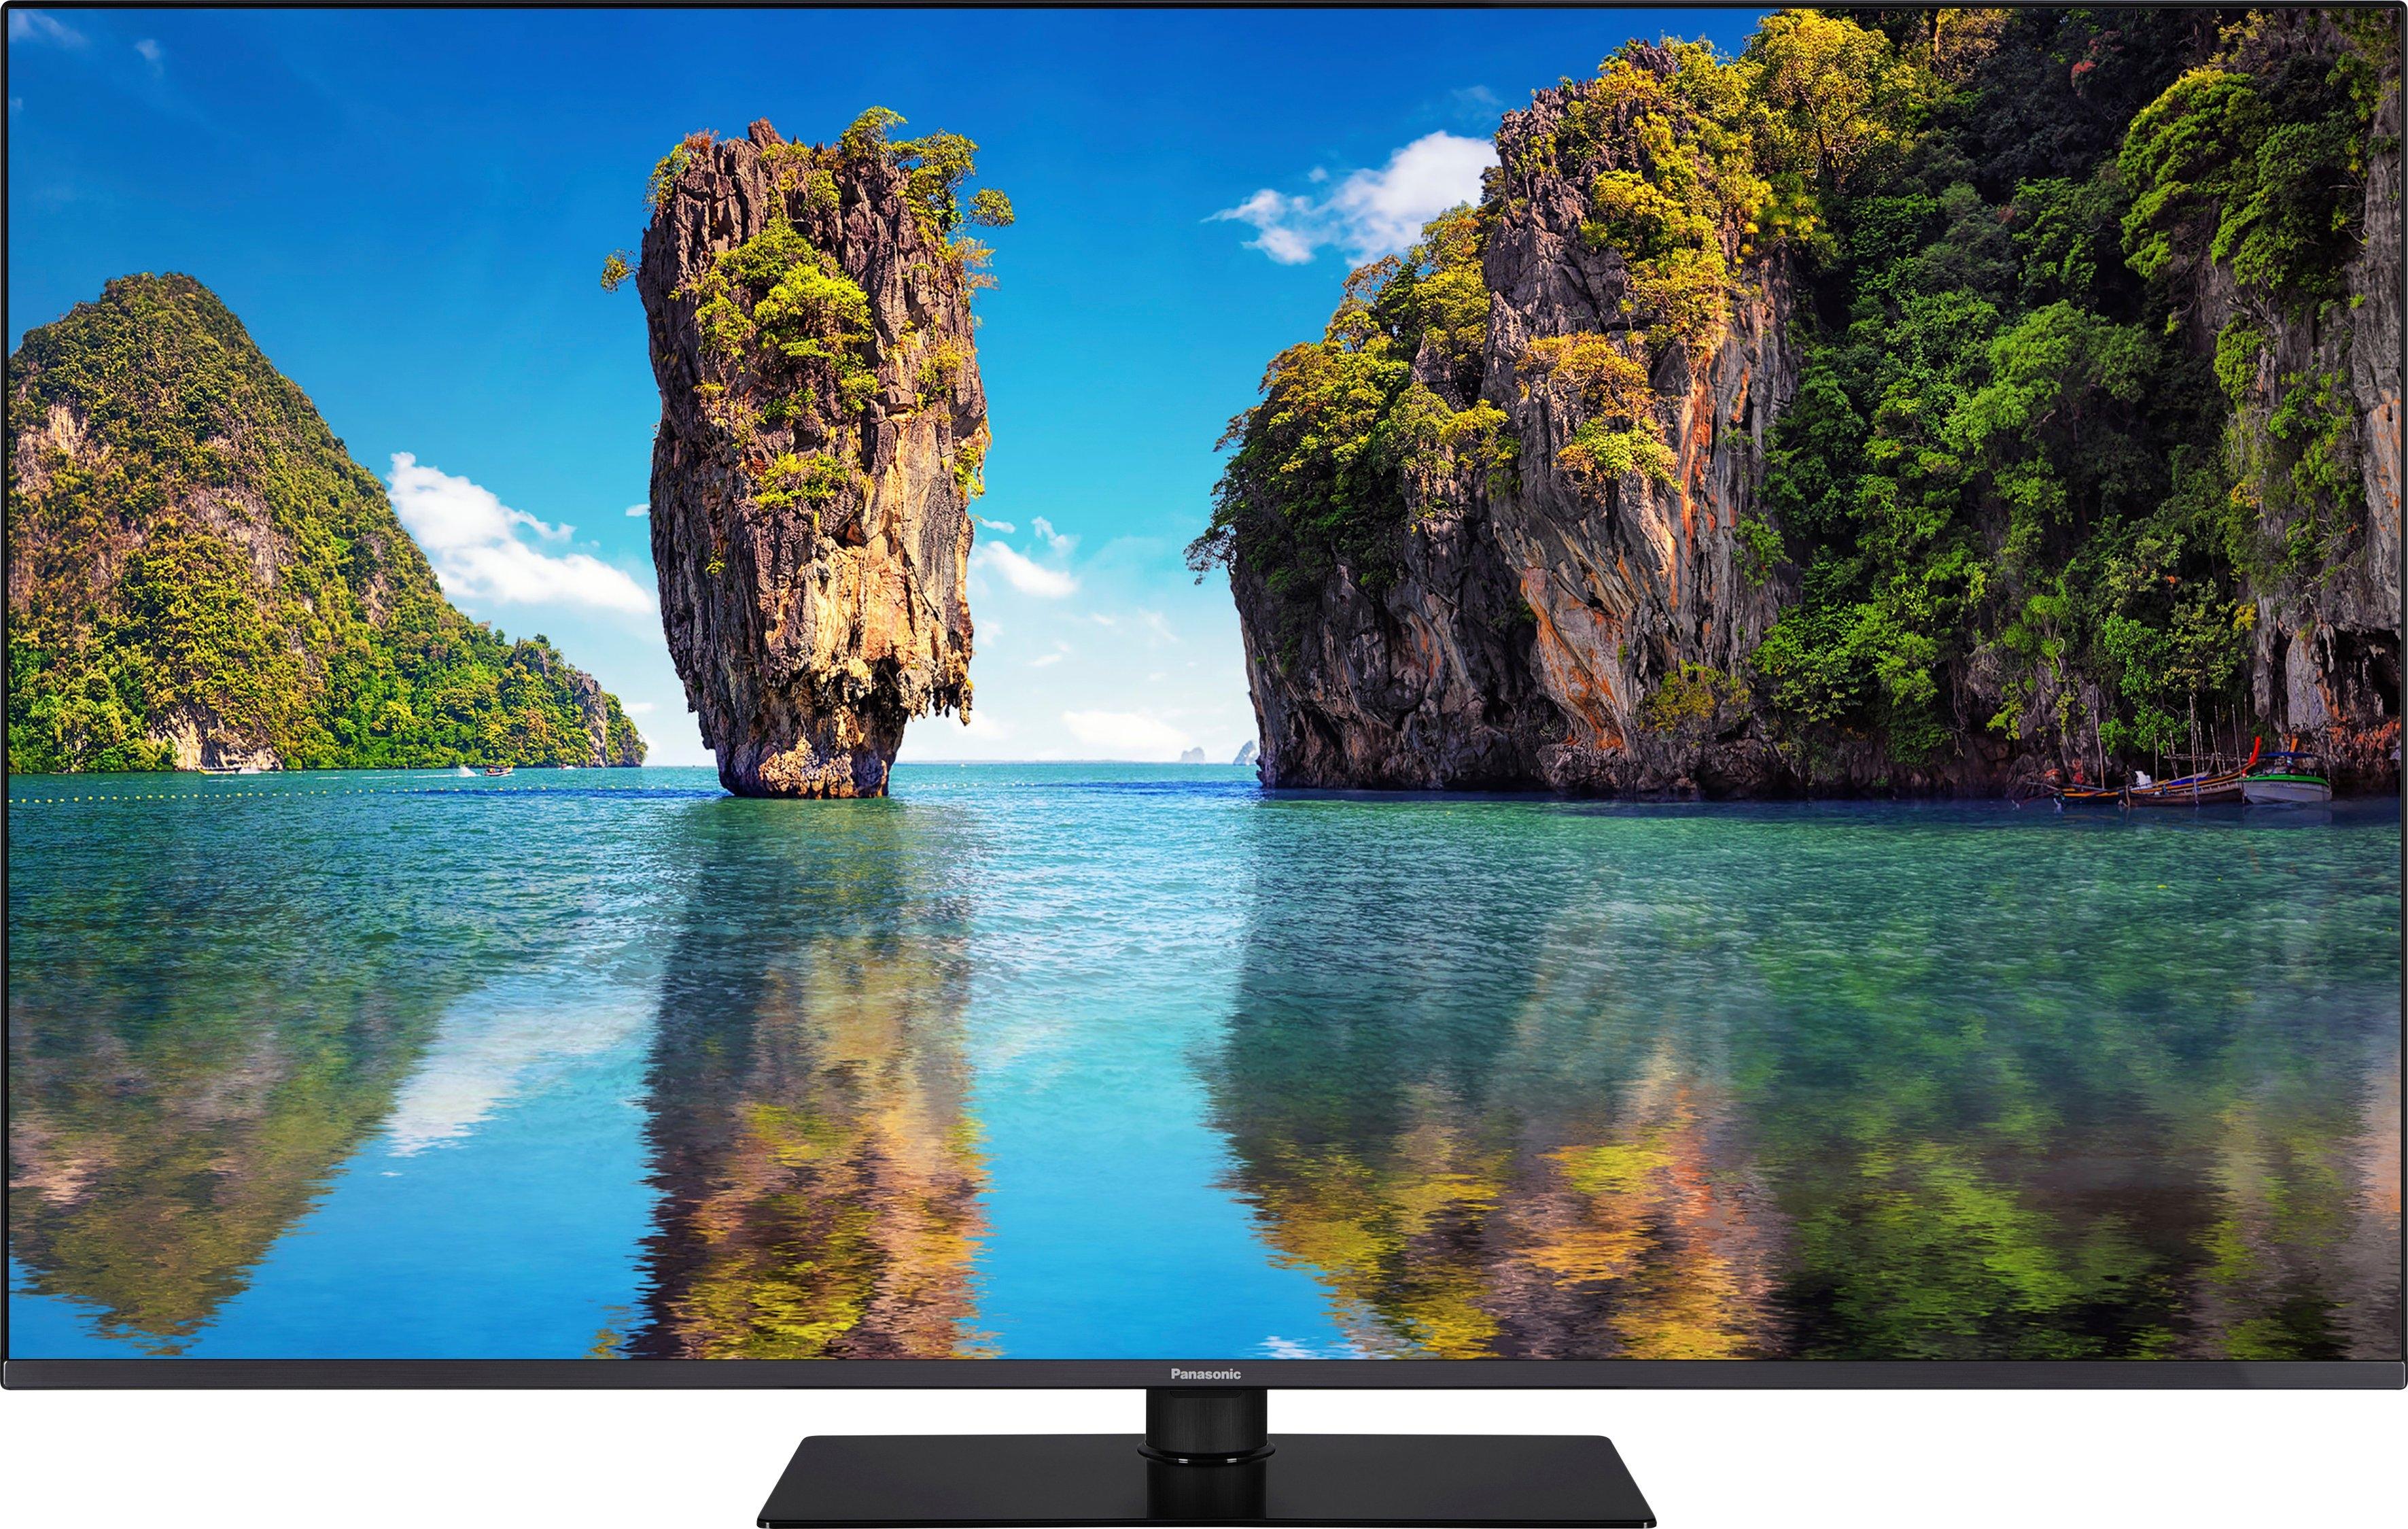 Panasonic LCD-LED-TV TX-55HXW704, 139 cm / 55